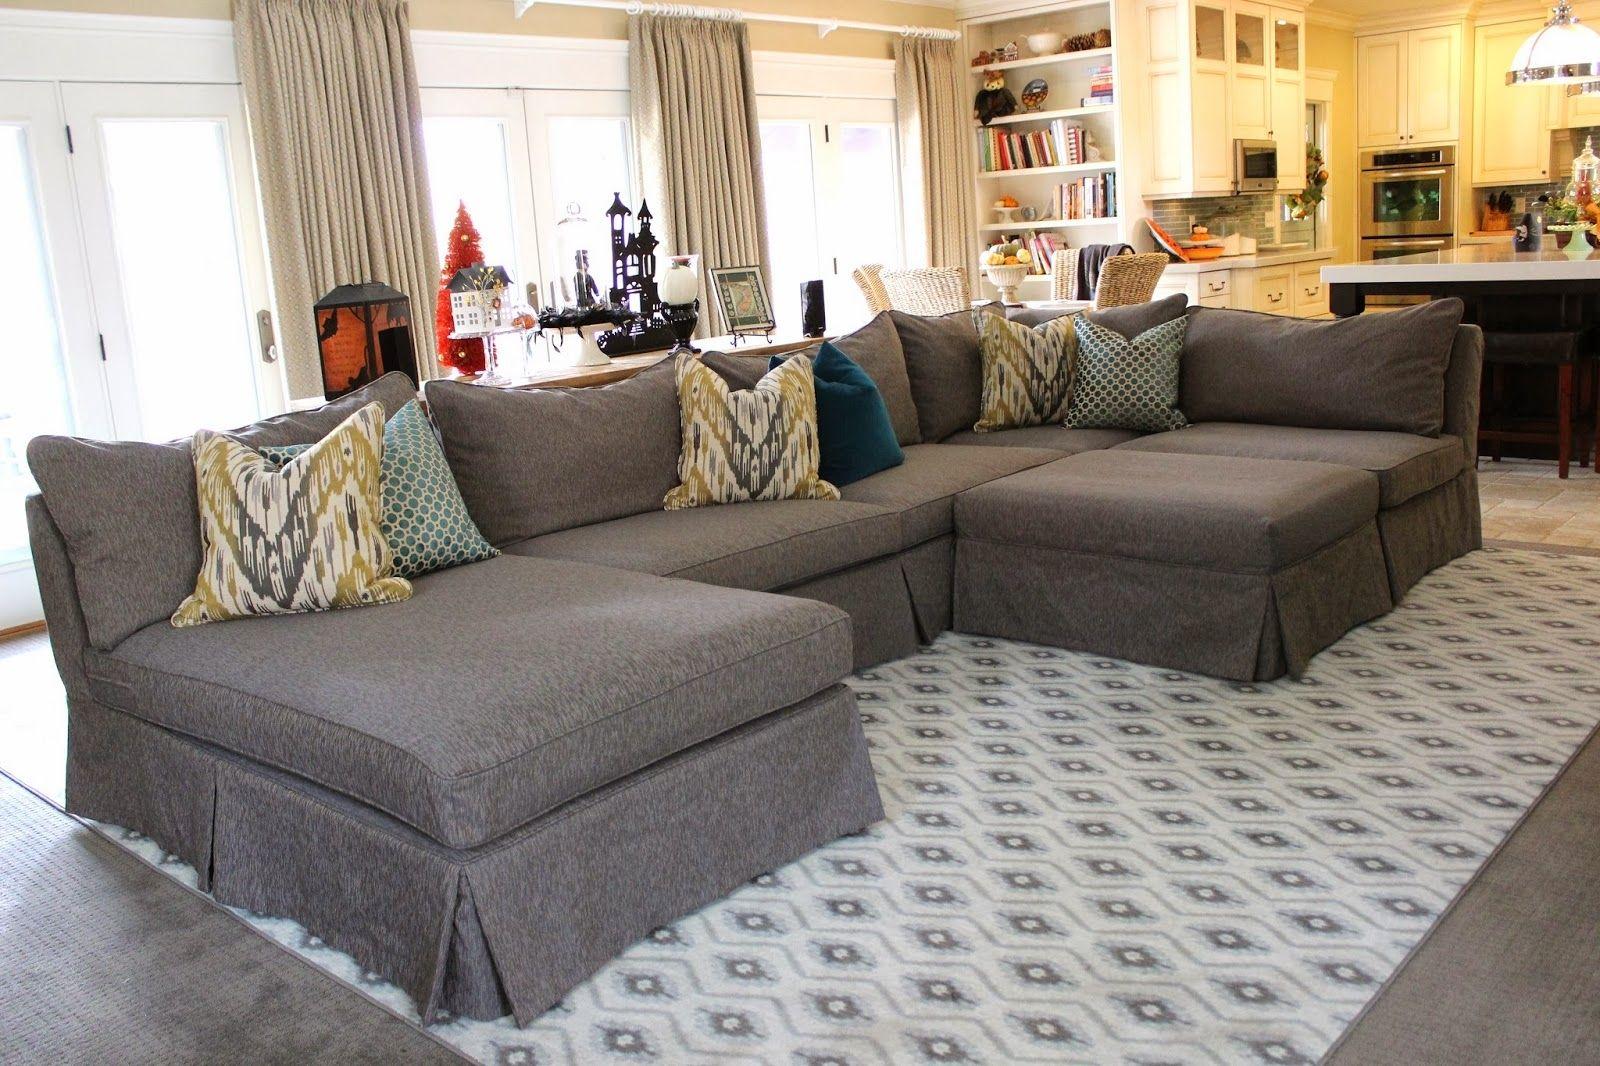 Armless Sectional Sofa Slipcovers Sectional slipcover